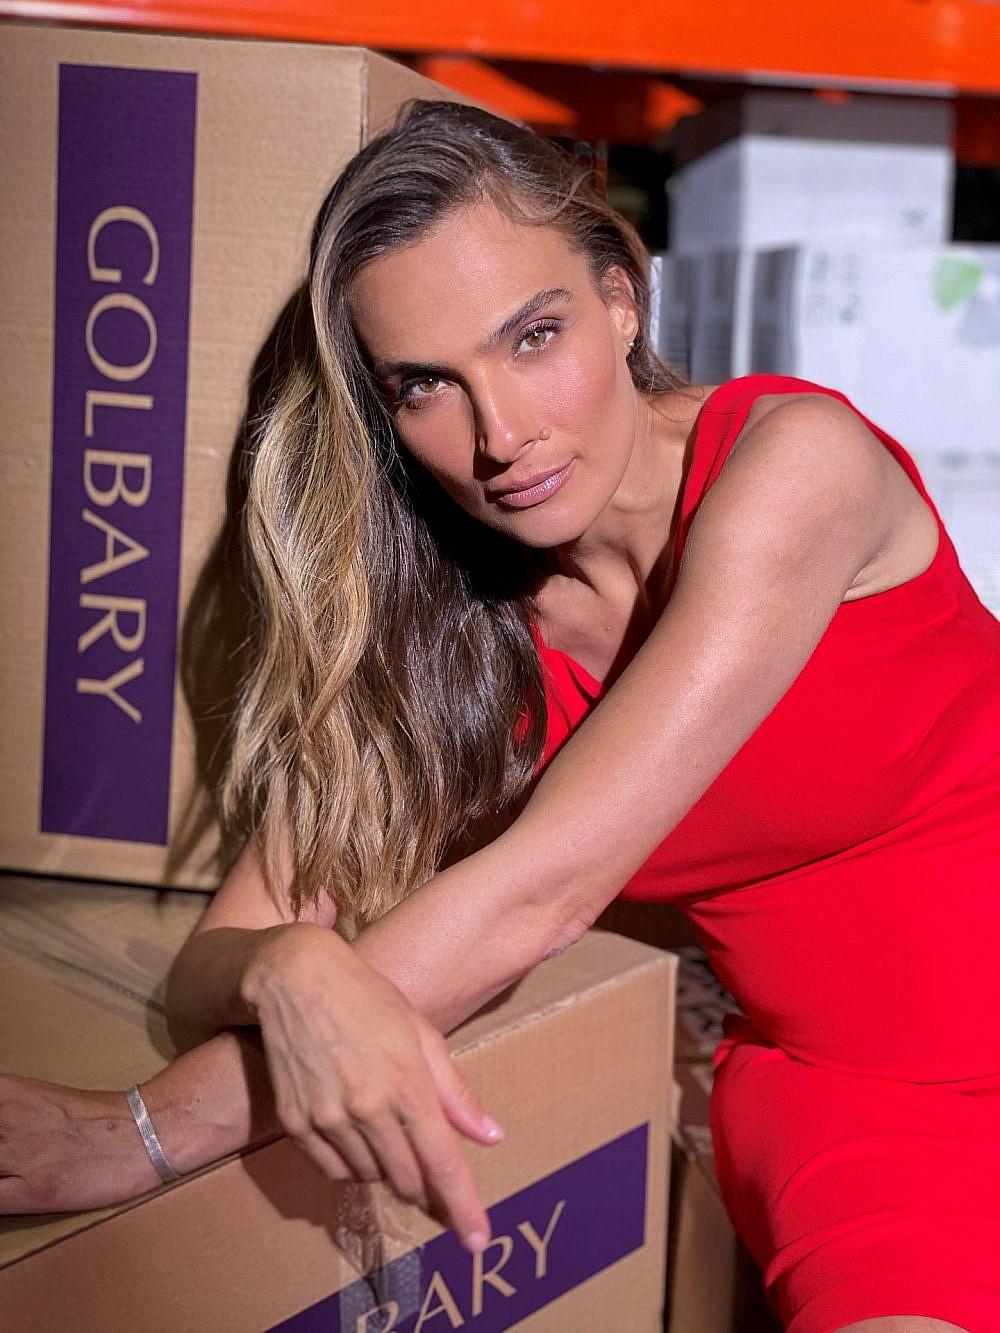 אילנית לוי | צילום: אייקונז ביי מדיו